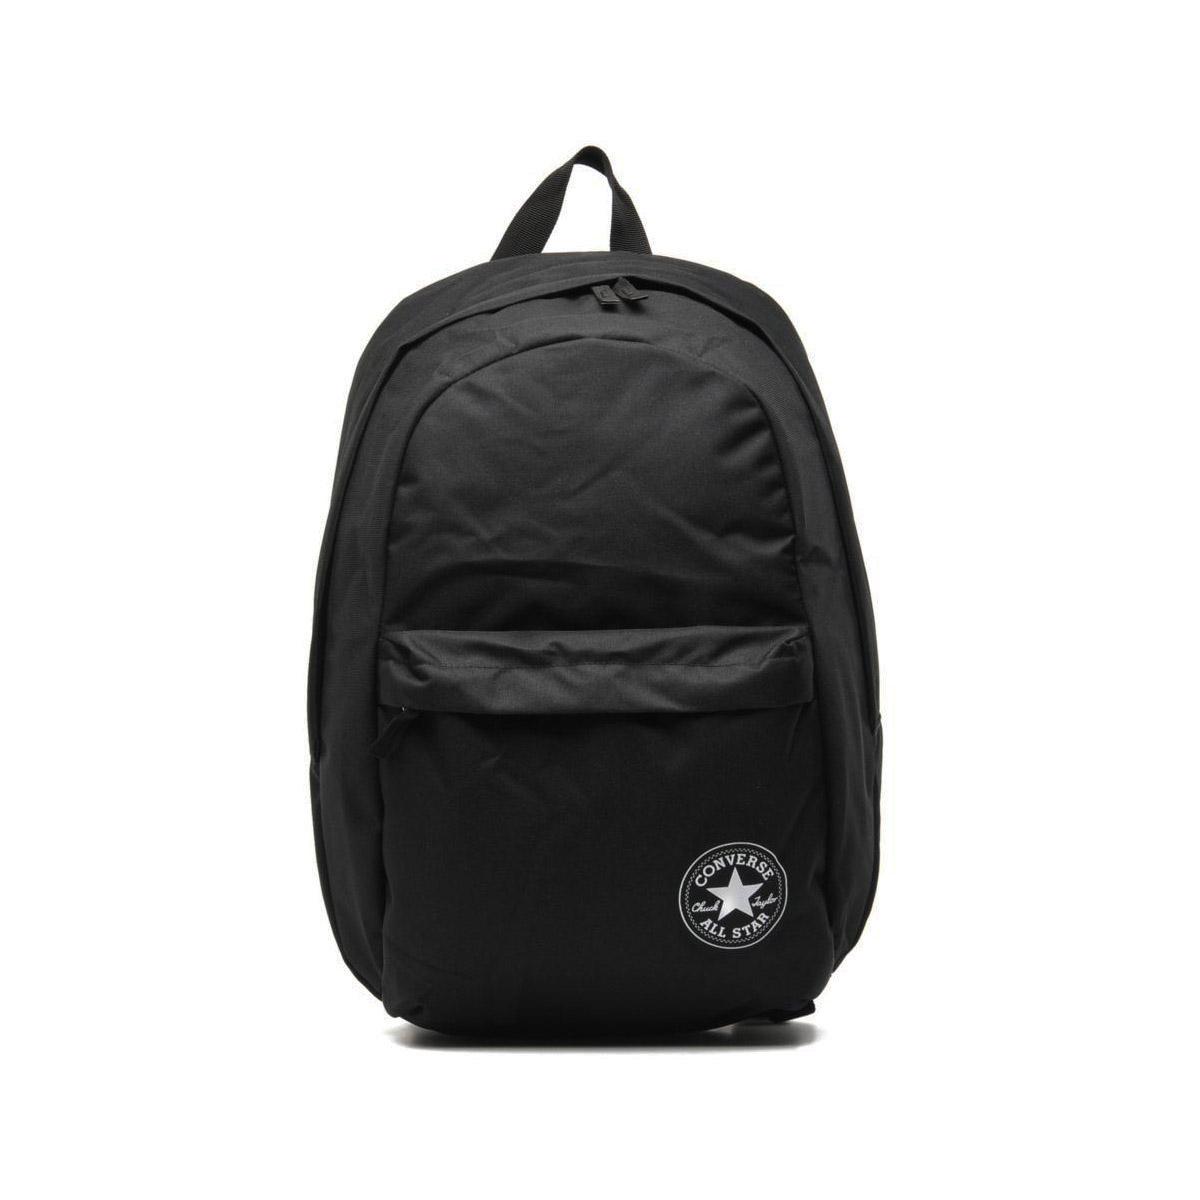 54761054fa Sac à dos Converse CTAS Backpack Noir | Terres Extrêmes